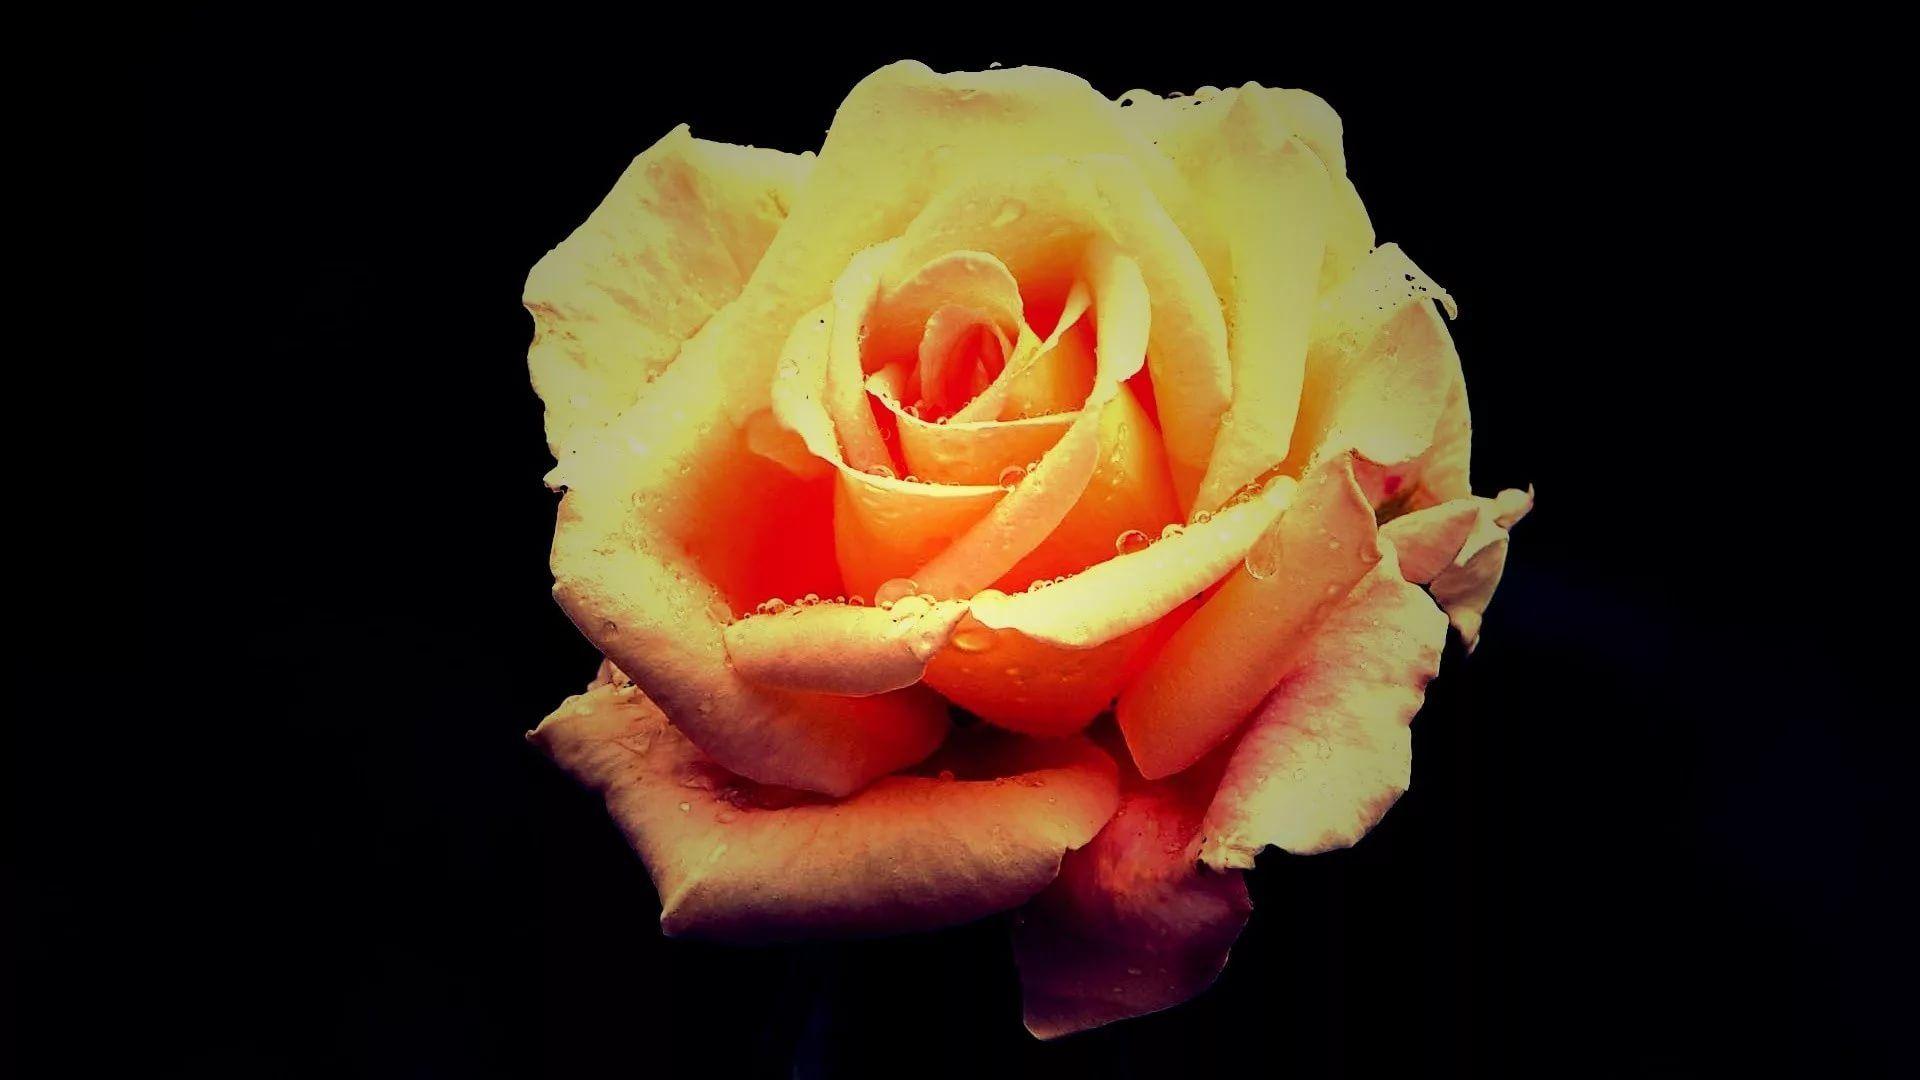 Rose Screensaver High Definition